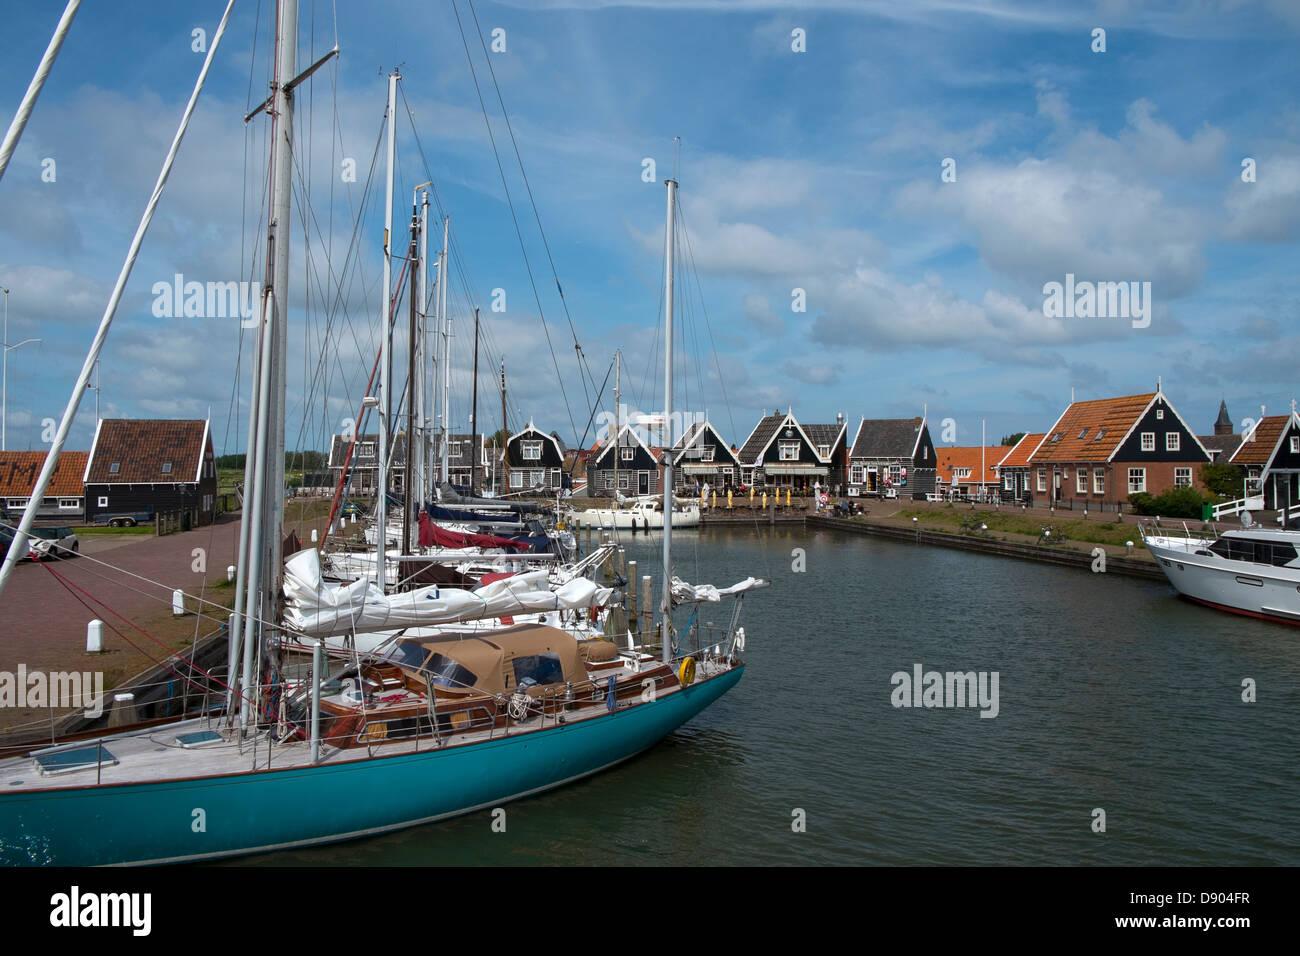 Netherlands. Marken, Harbour - Stock Image